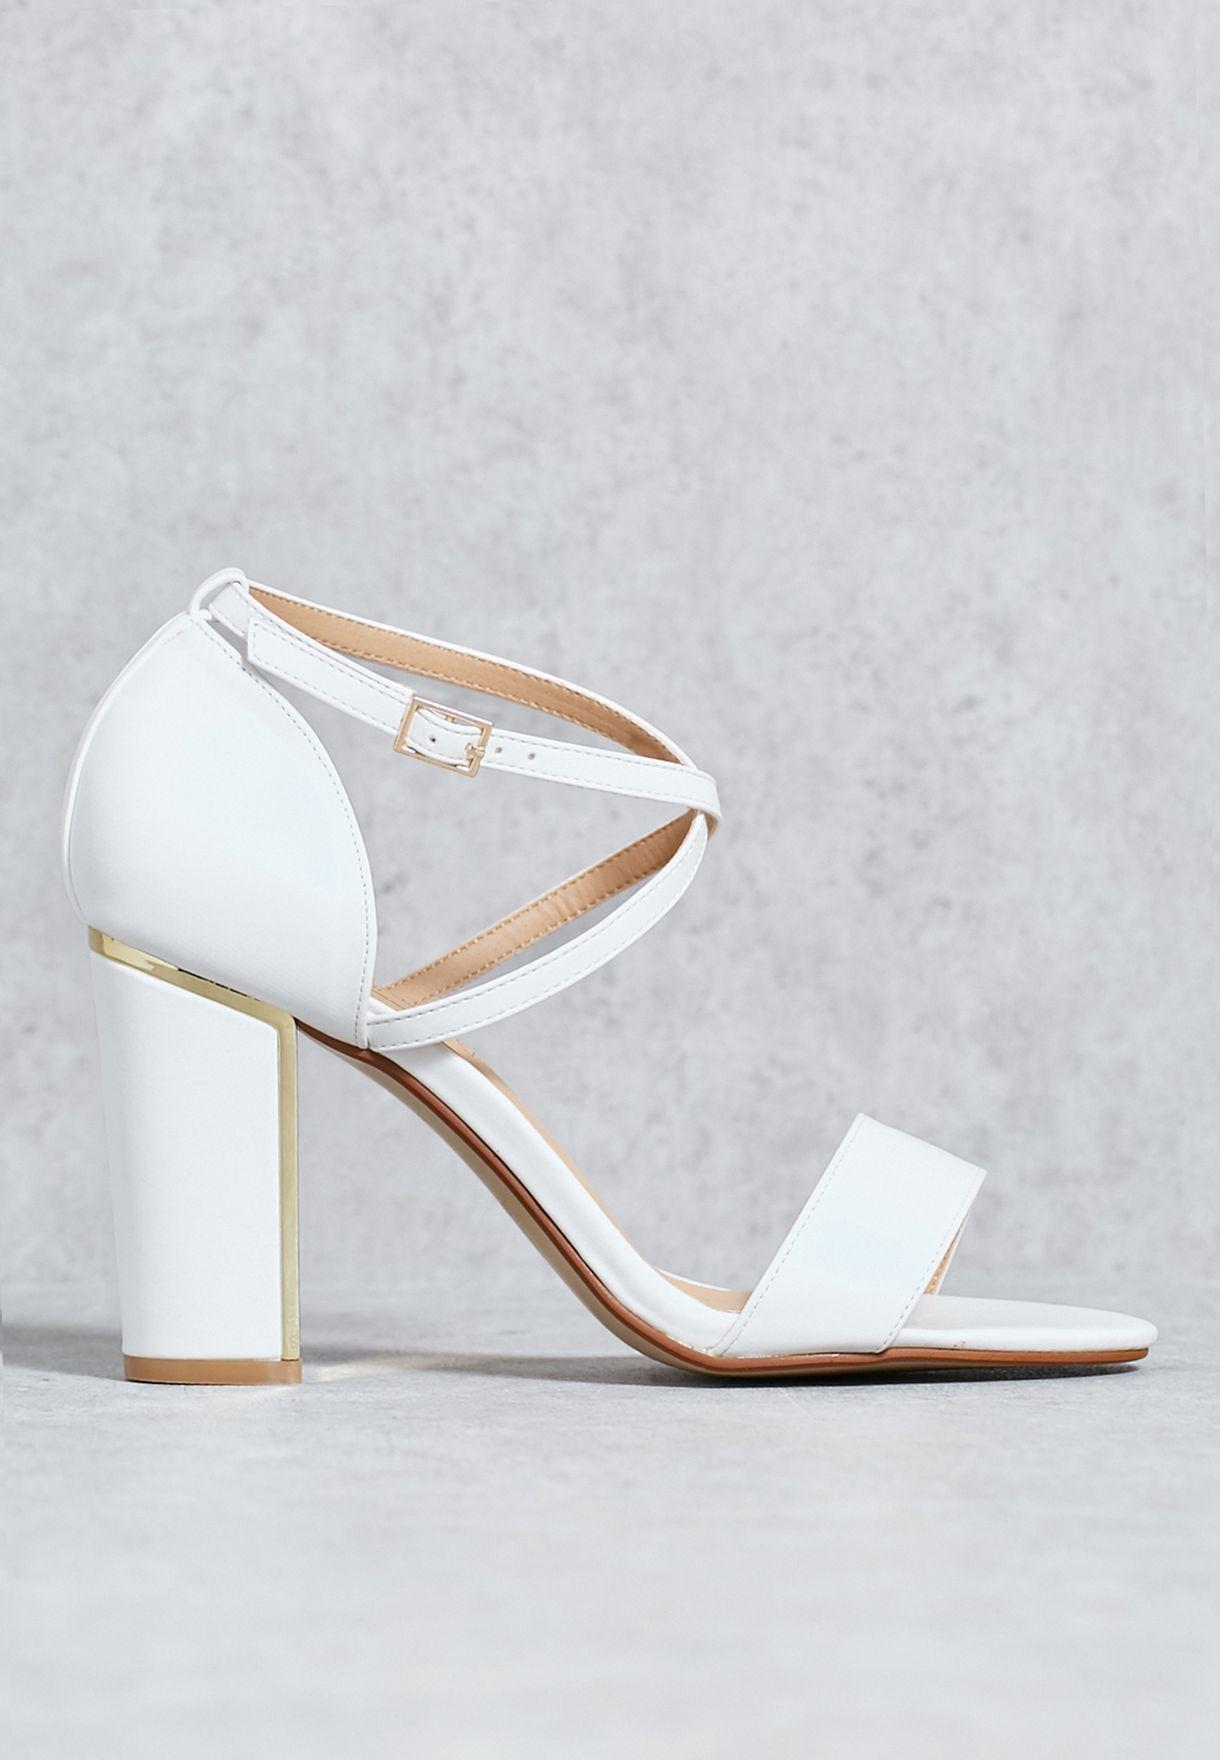 39c766db67 Shop Truffle white Block heel sandal FALLON2/B for Women in Oman ...